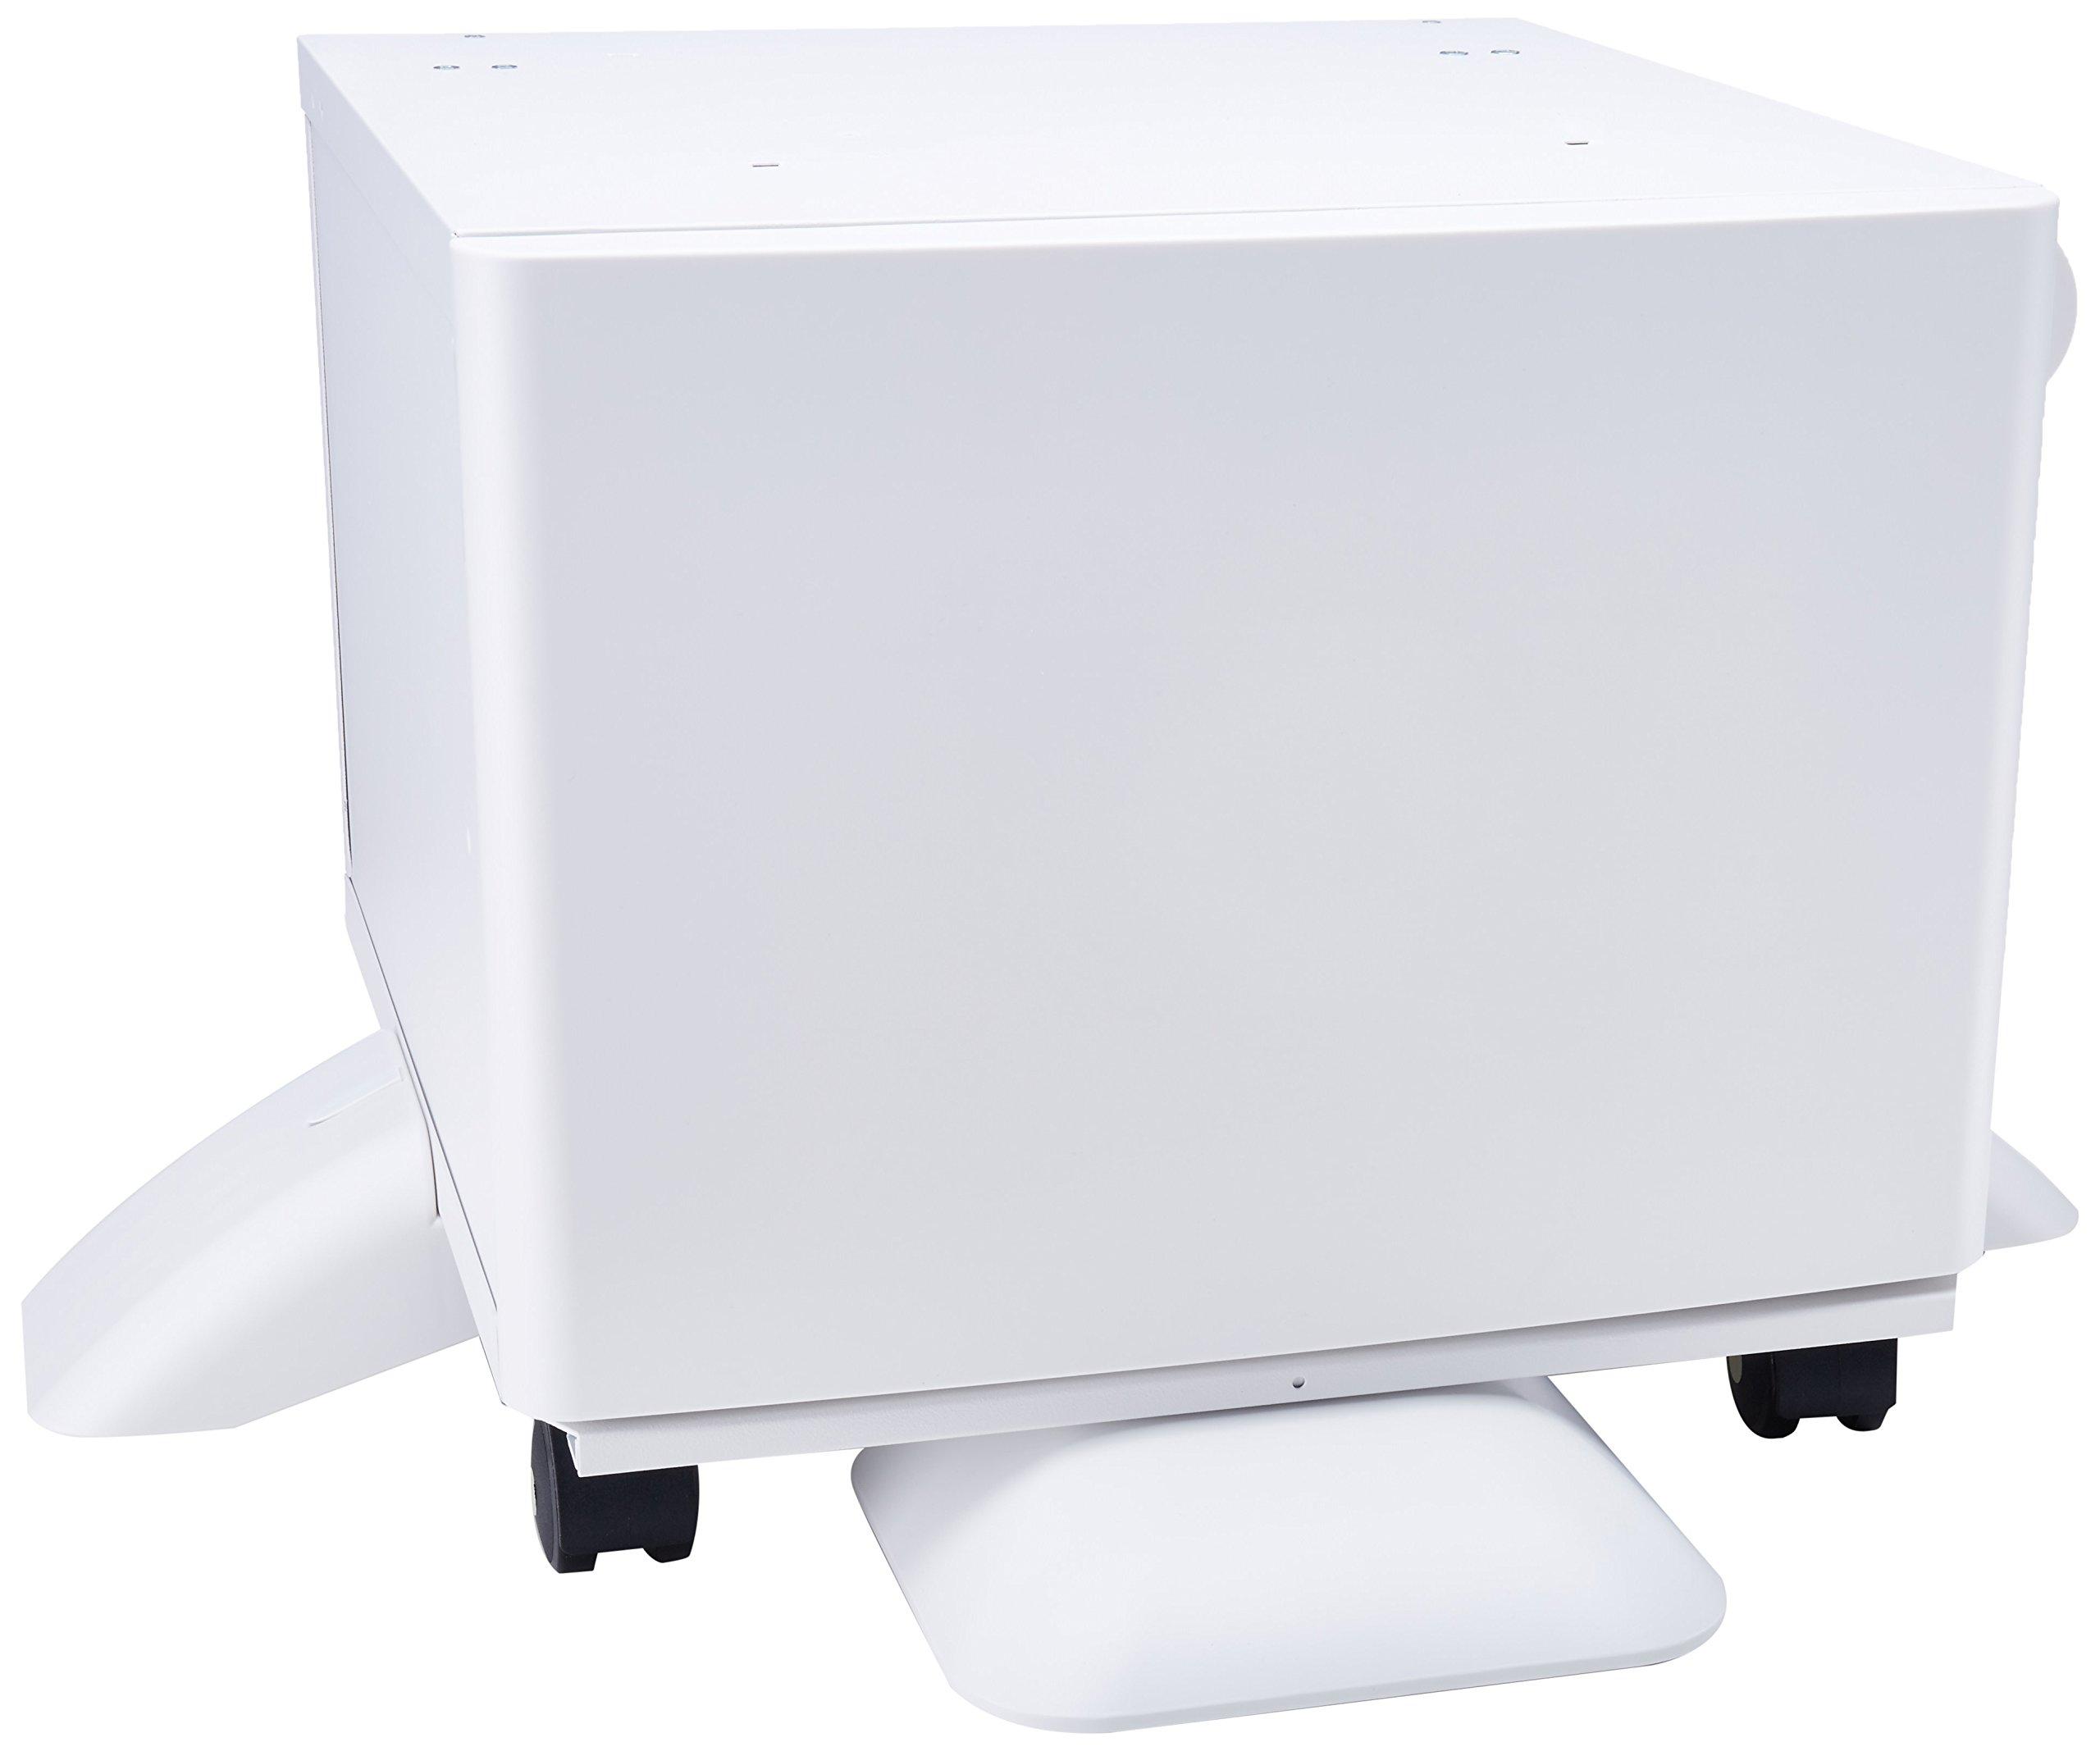 Xerox Printer Stand (497K13660) by Xerox